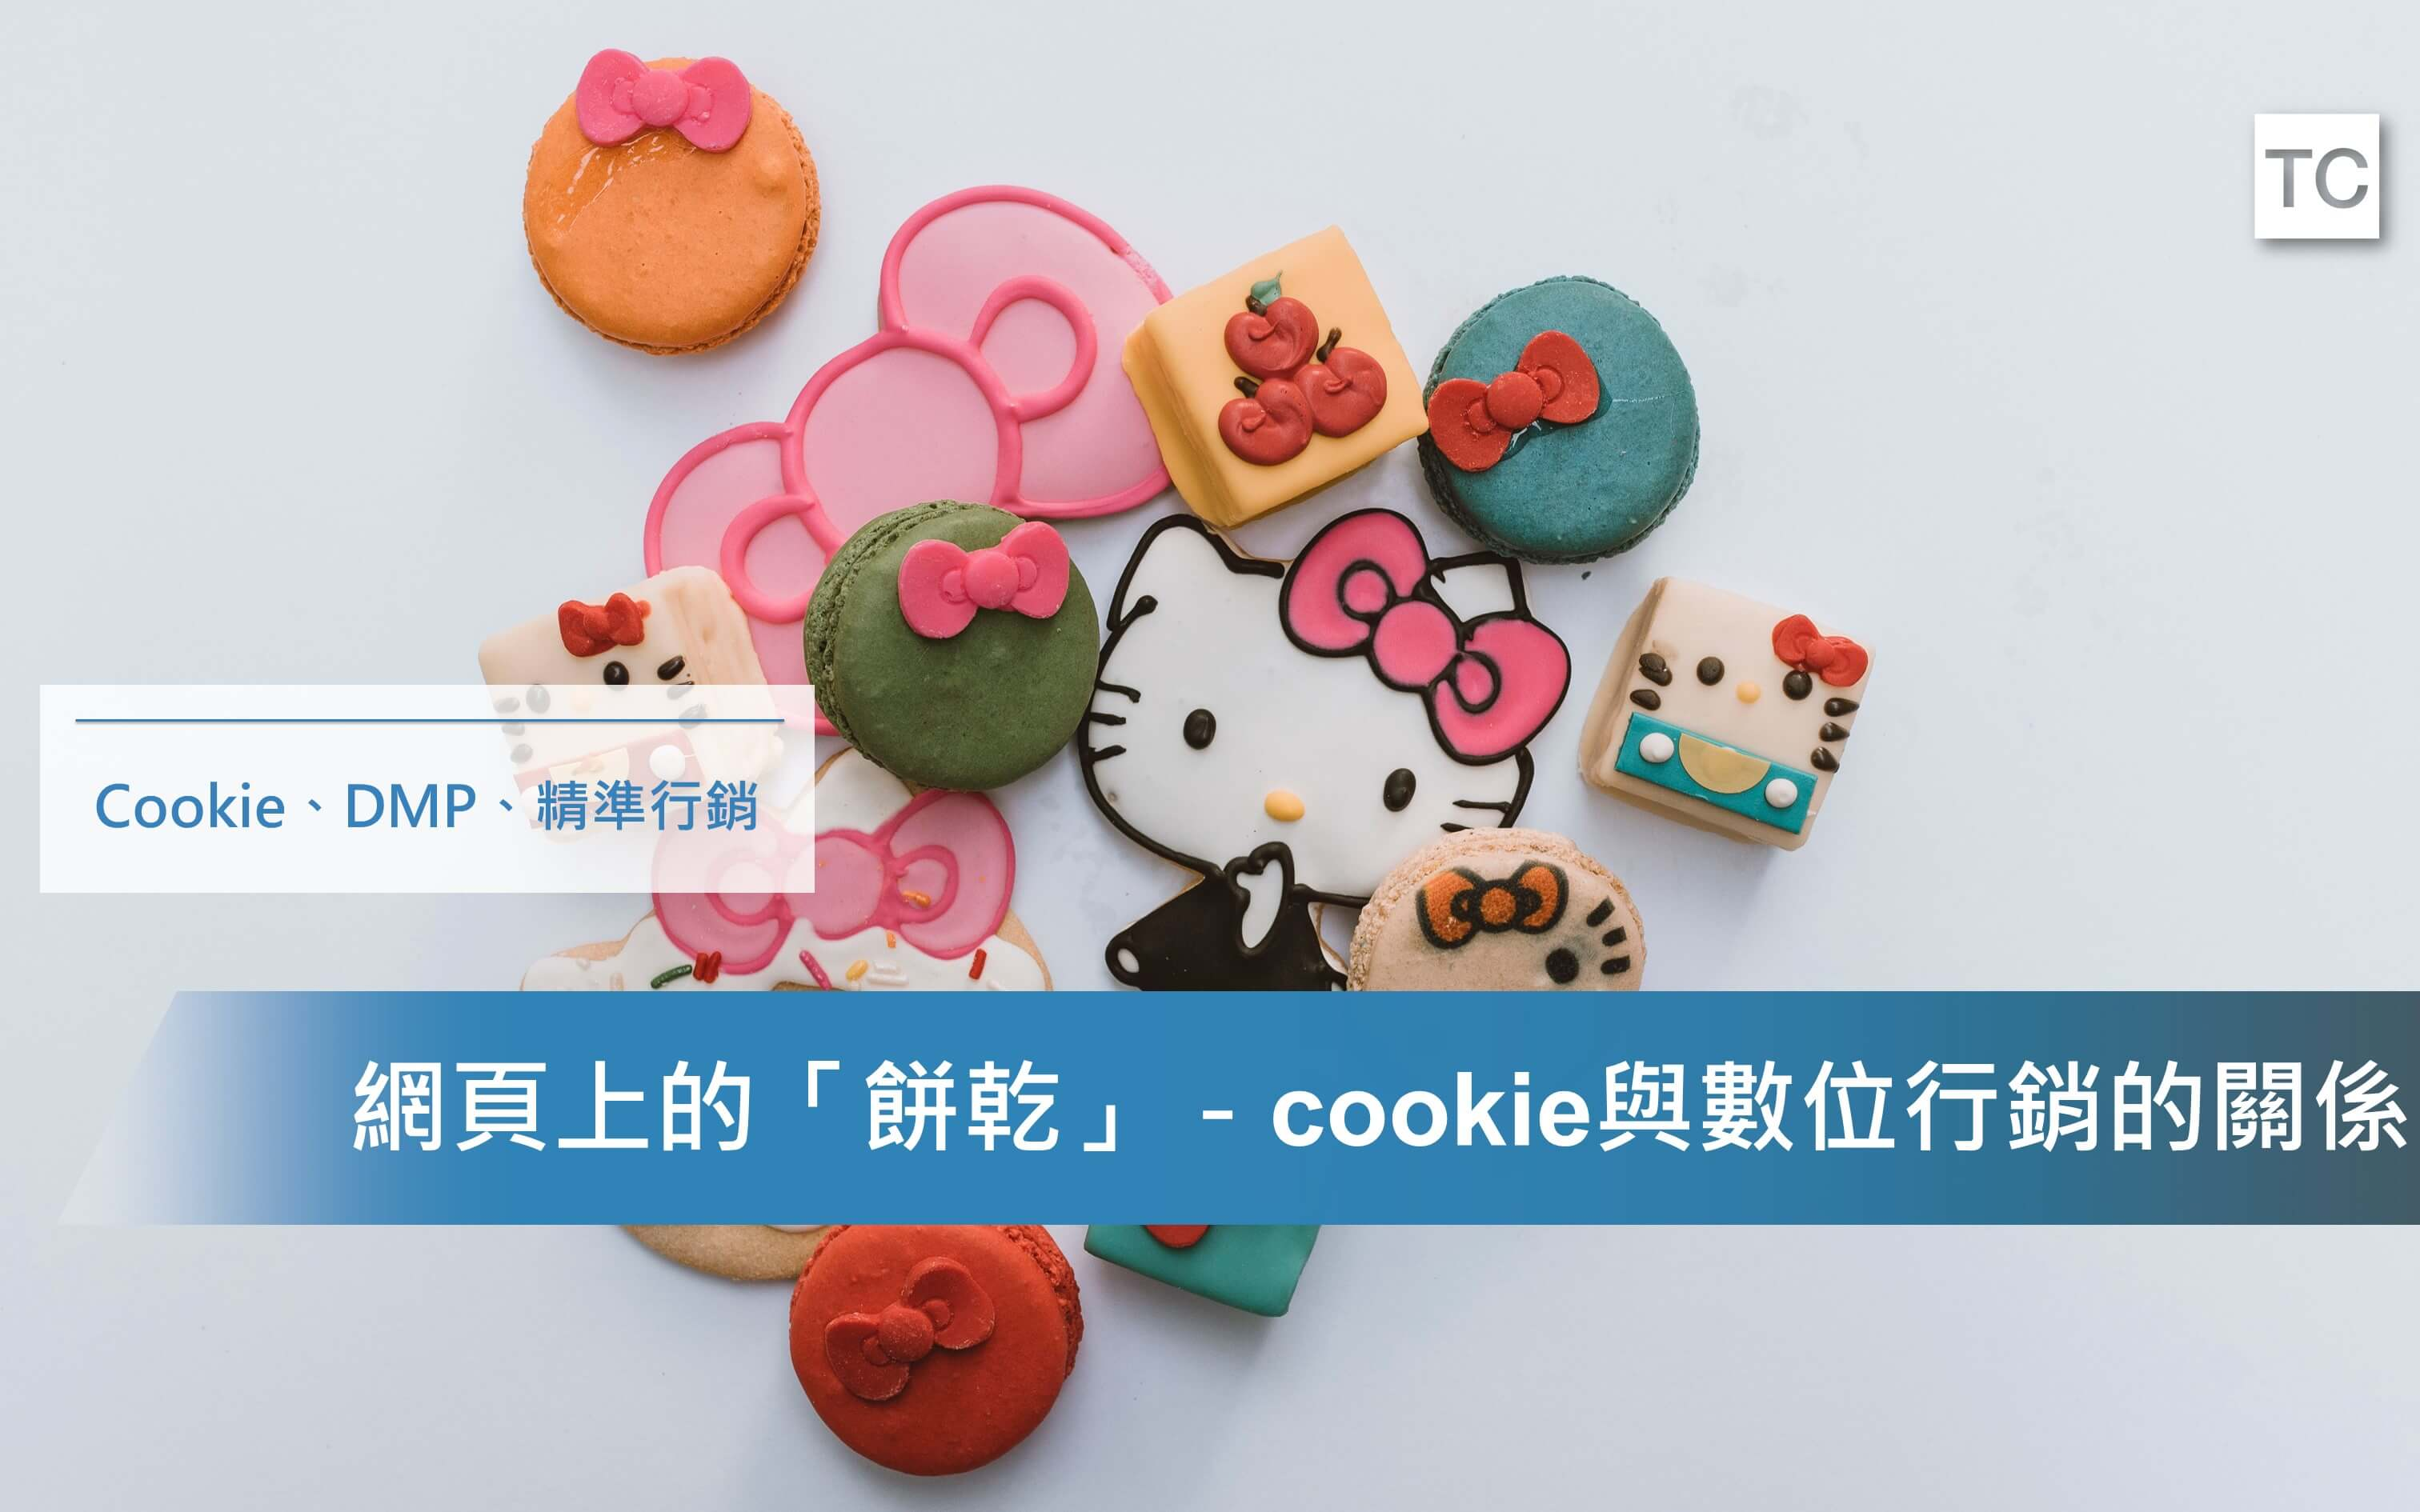 DMP與Cookie廣告, 究竟同意cookie能讓廣告商做些甚麼?